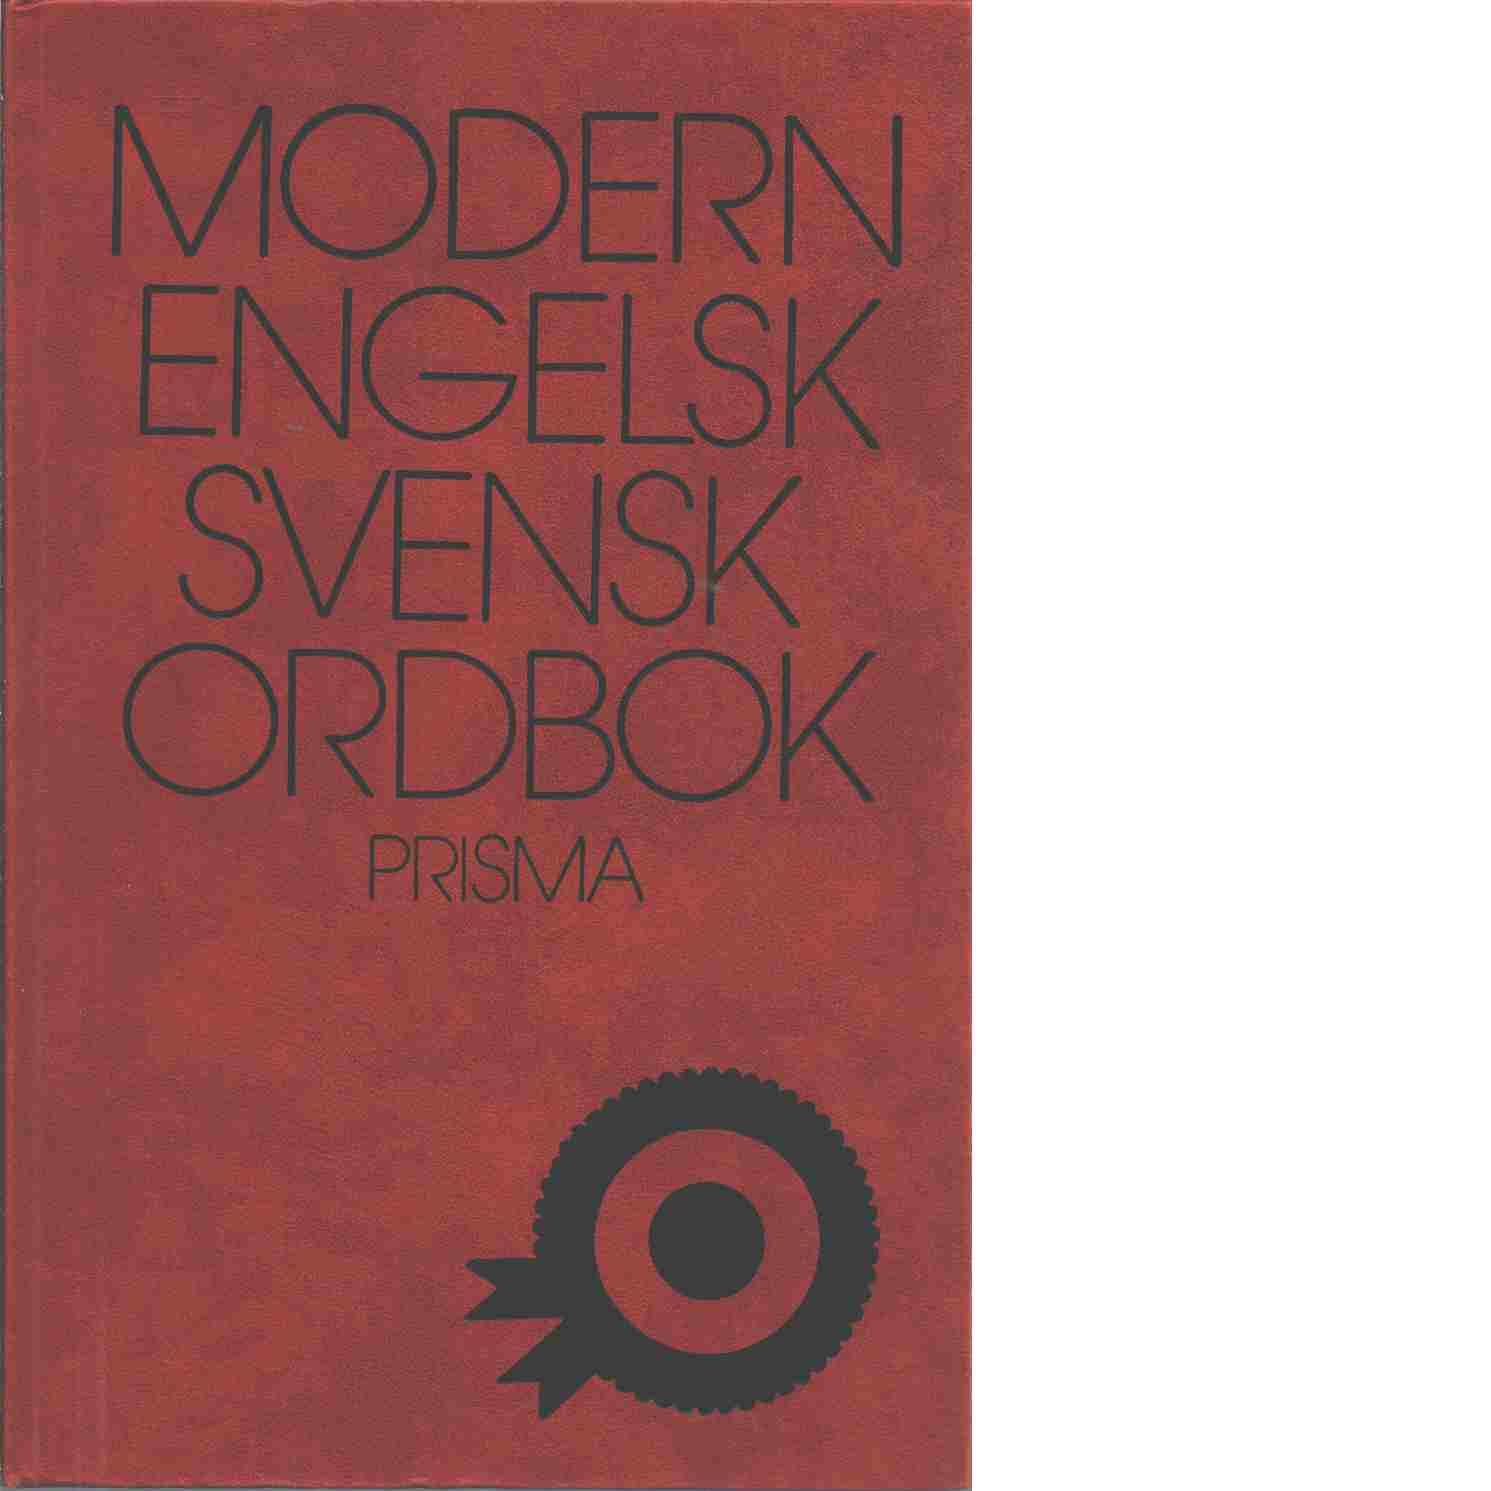 Modern engelsk-svensk ordbok : A modern English-Swedish dictionary - Danielsson, Bror